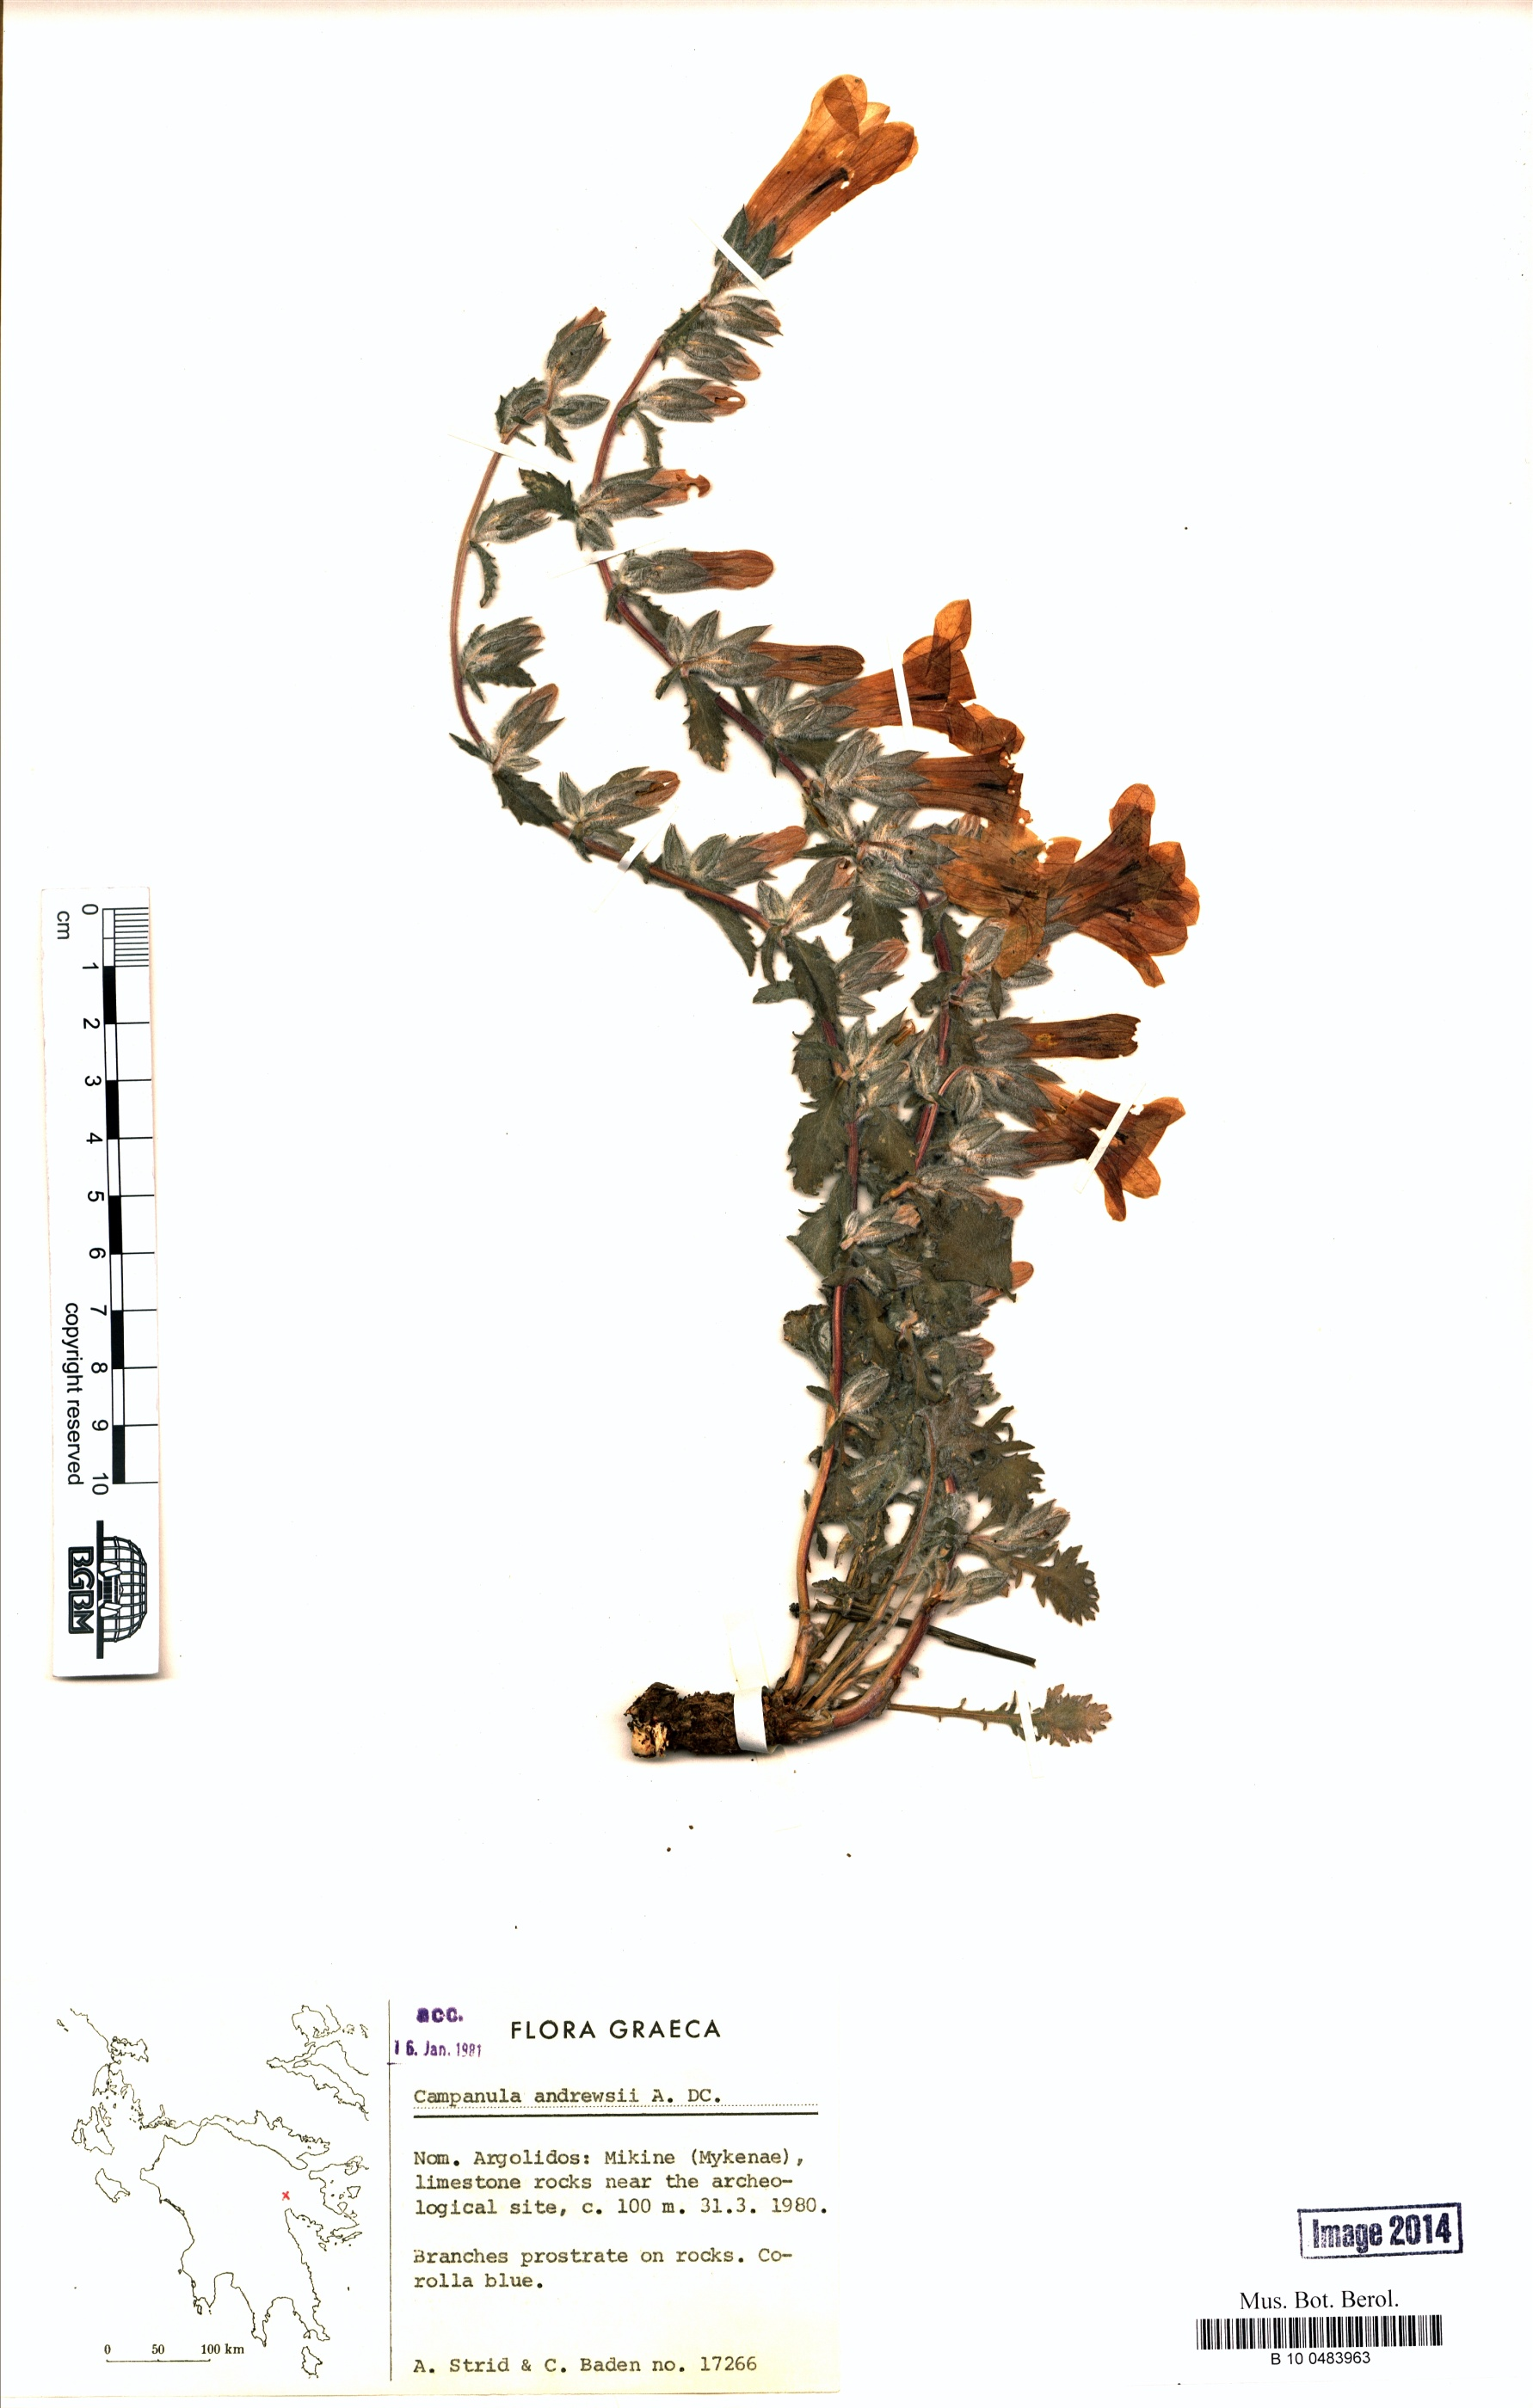 http://ww2.bgbm.org/herbarium/images/B/10/04/83/96/B_10_0483963.jpg